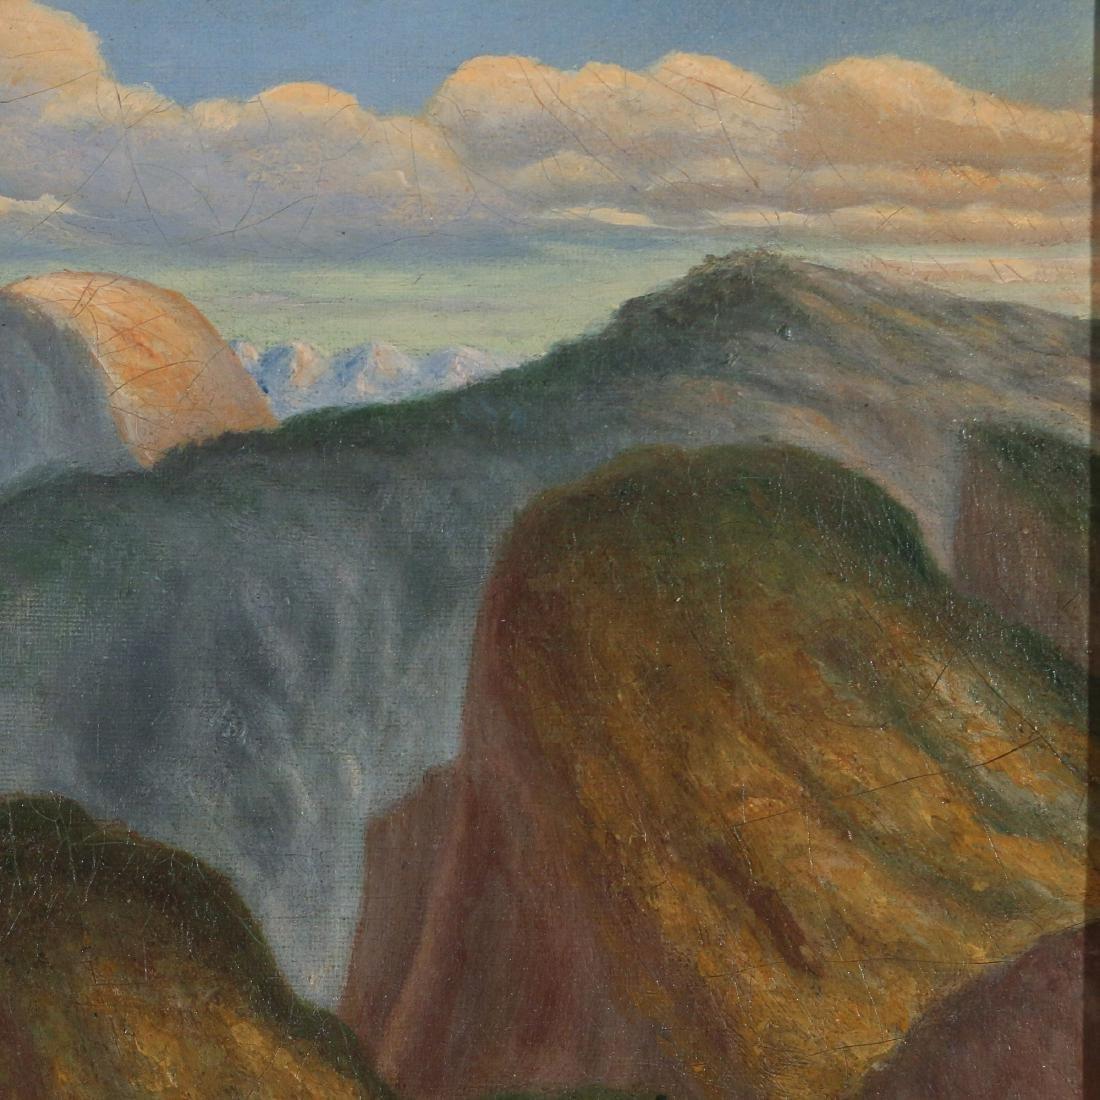 EARLY CALIFORNIA LANDSCAPE, 19th/20th Century - 4